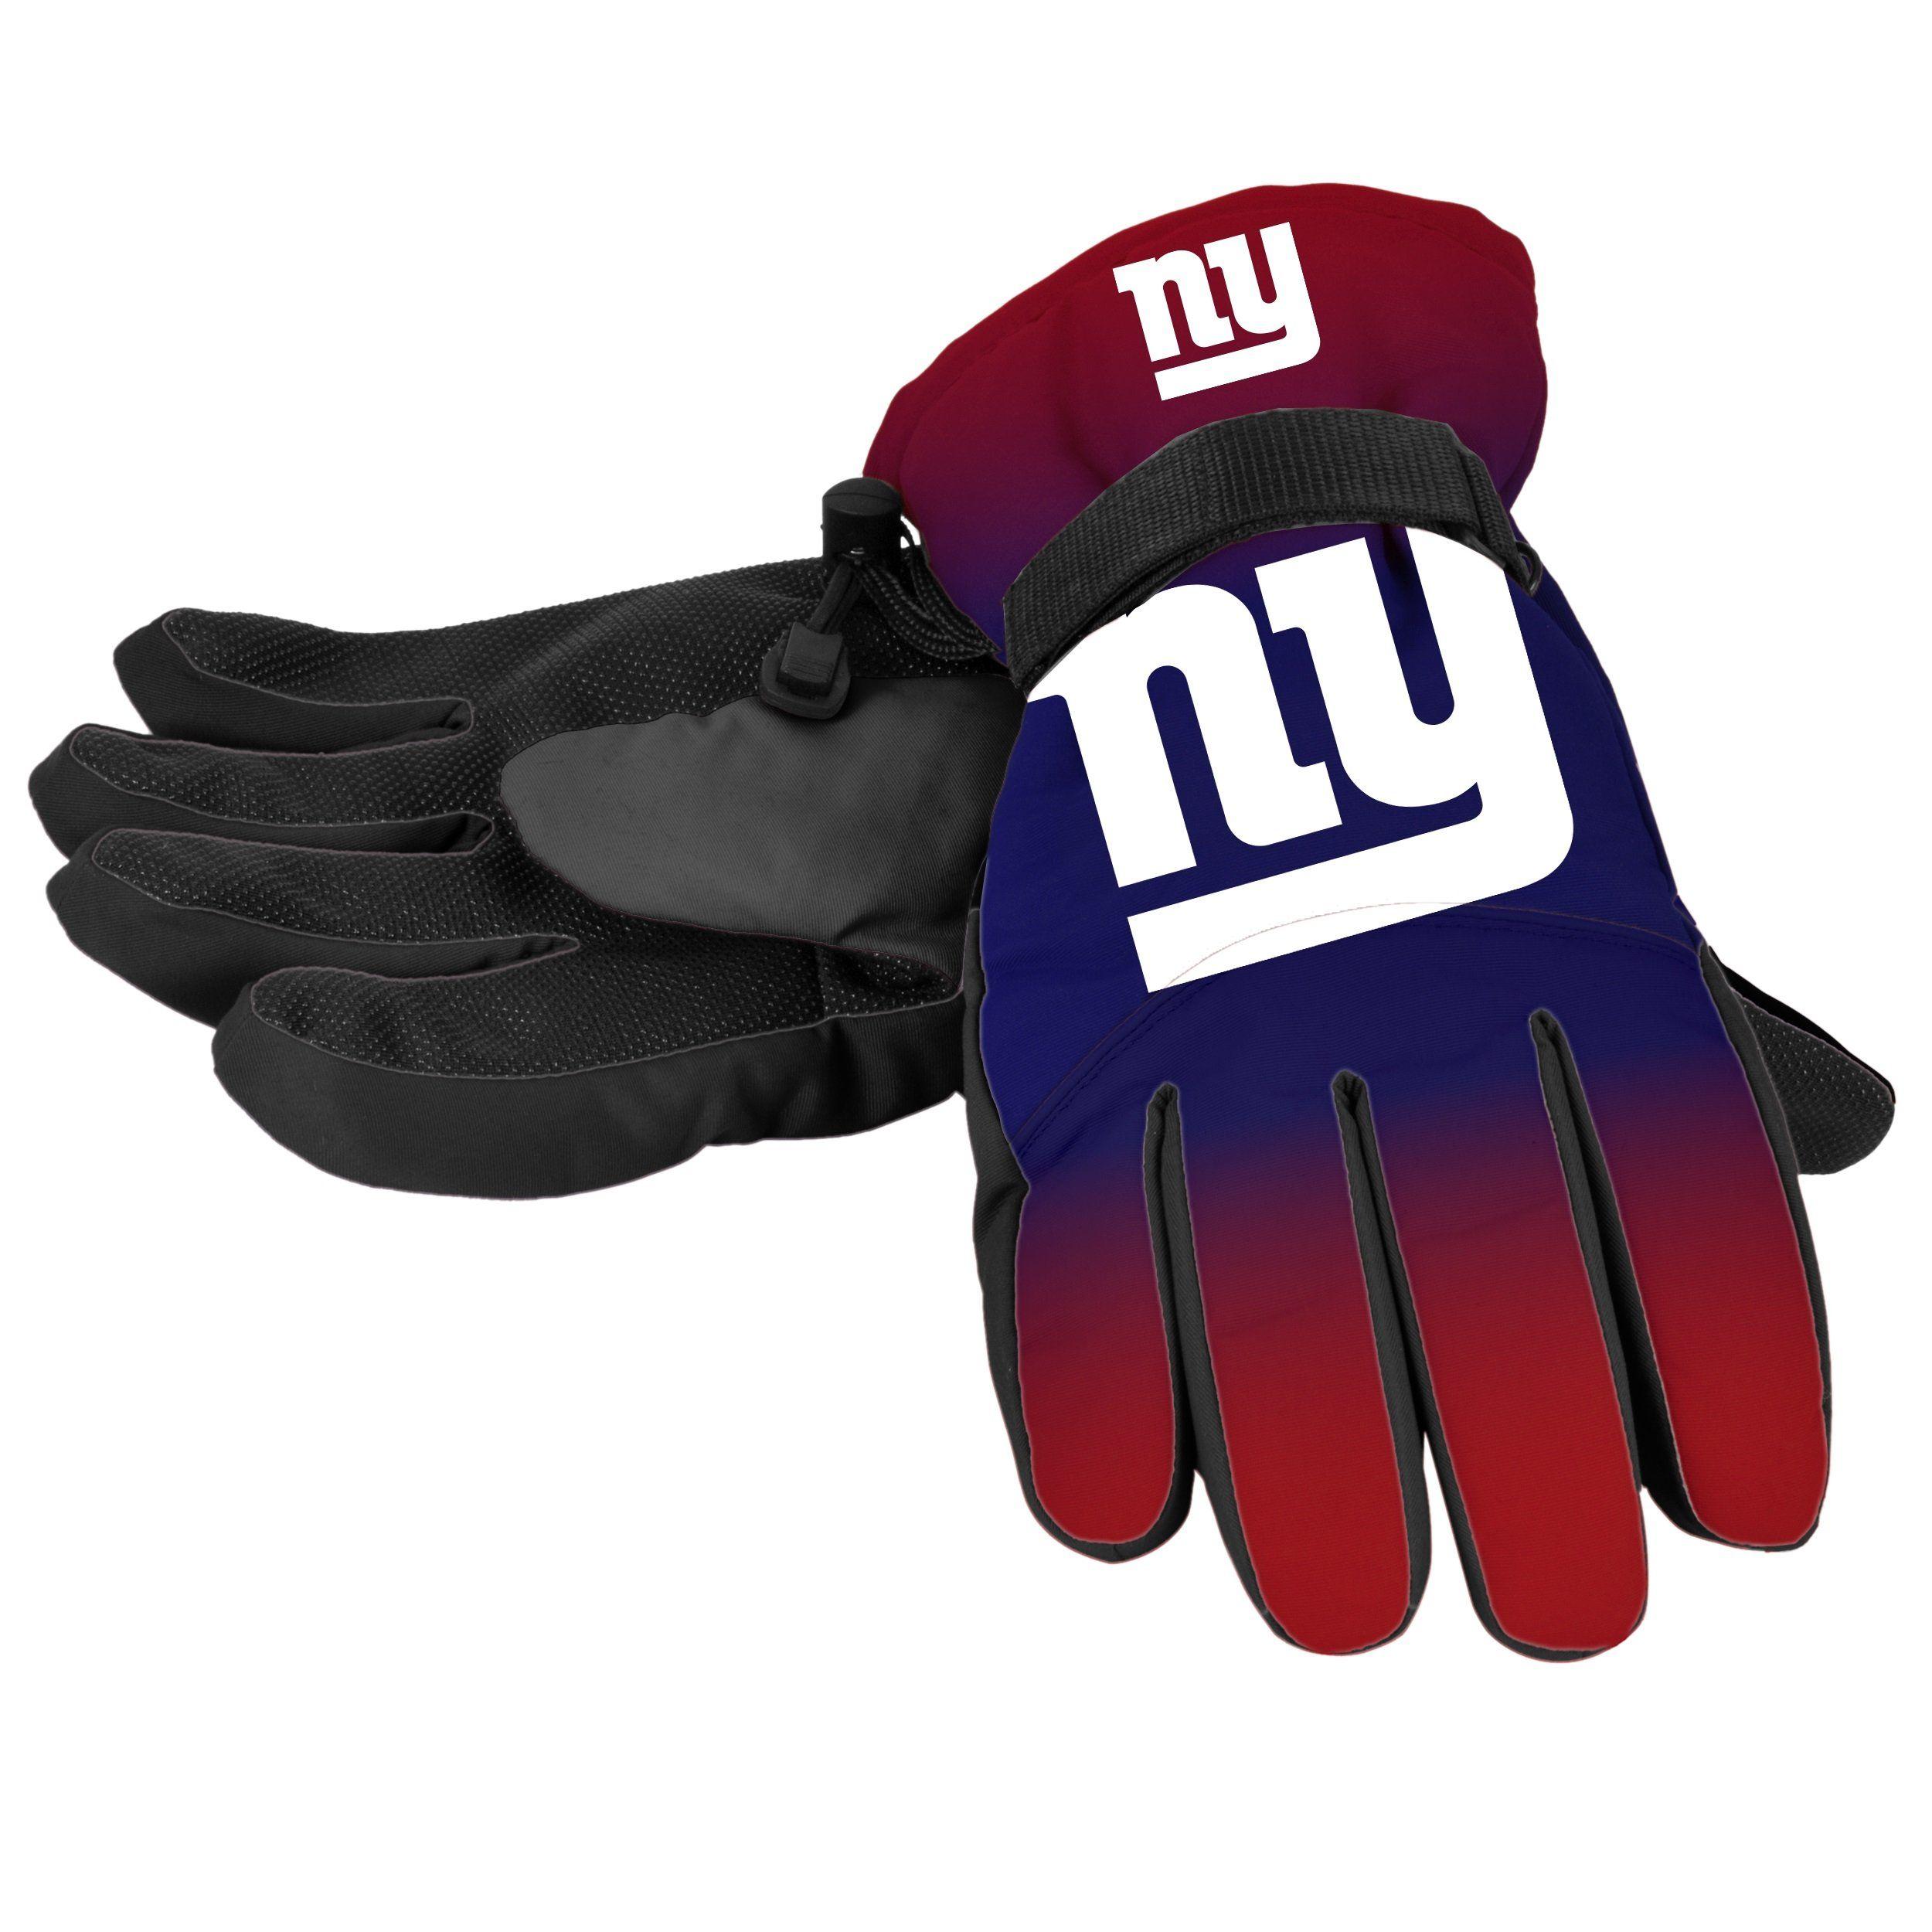 NFL Football New York Giants 2 Tone Rubber Dot Grip Winter Utility Work Gloves